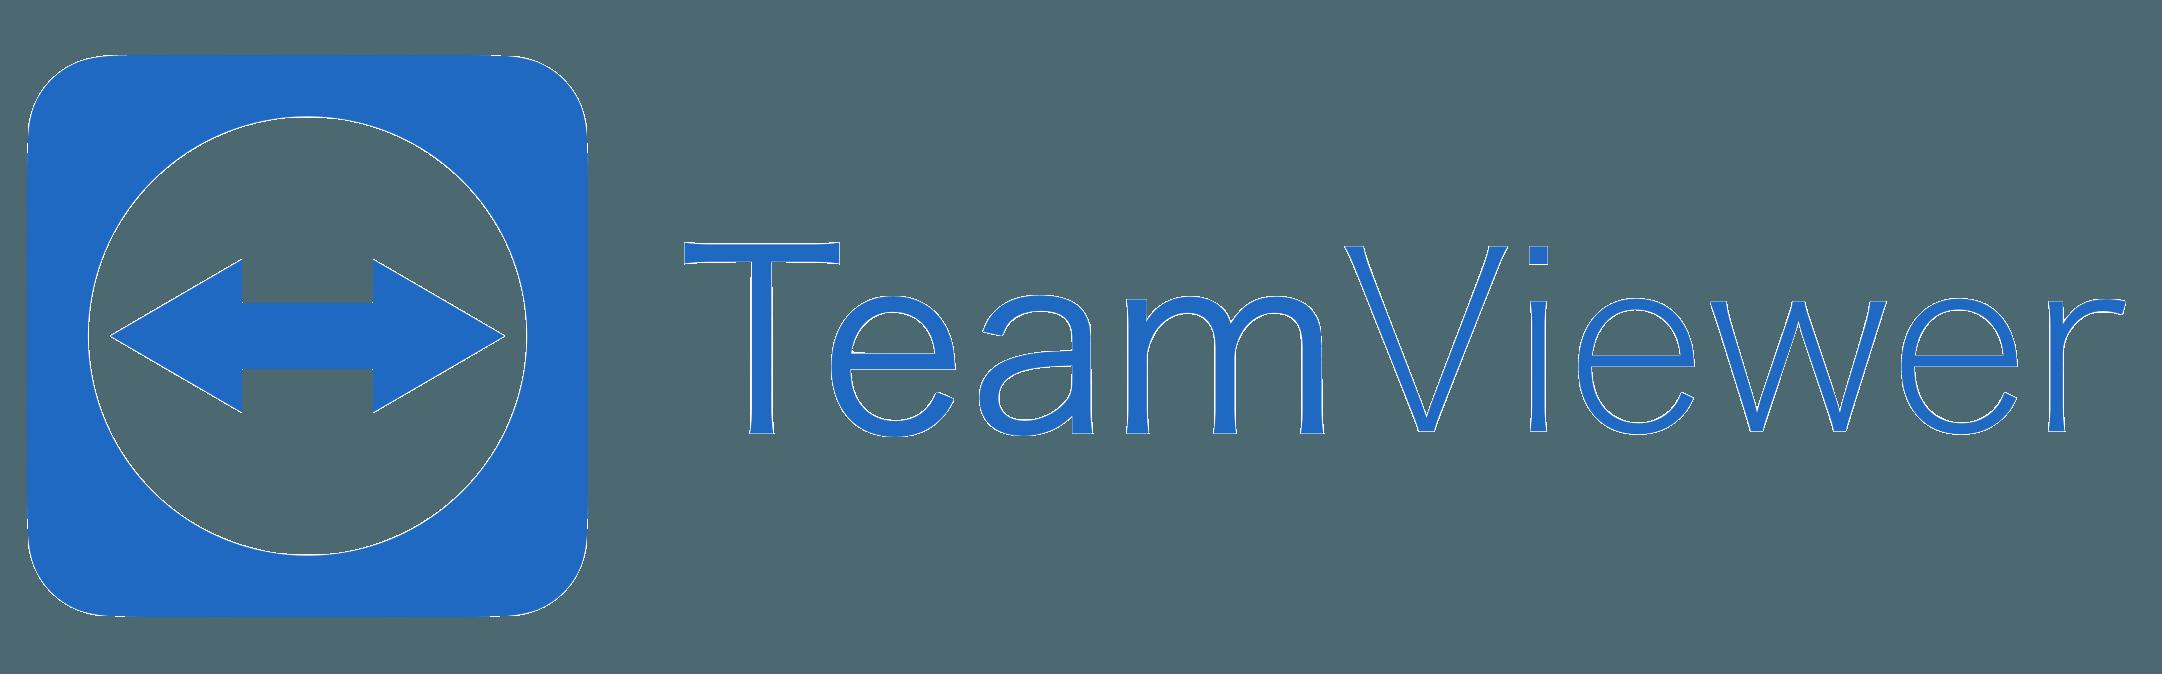 http://hypernovalabs.com/wp-content/uploads/2019/03/TeamViewer-logo.png